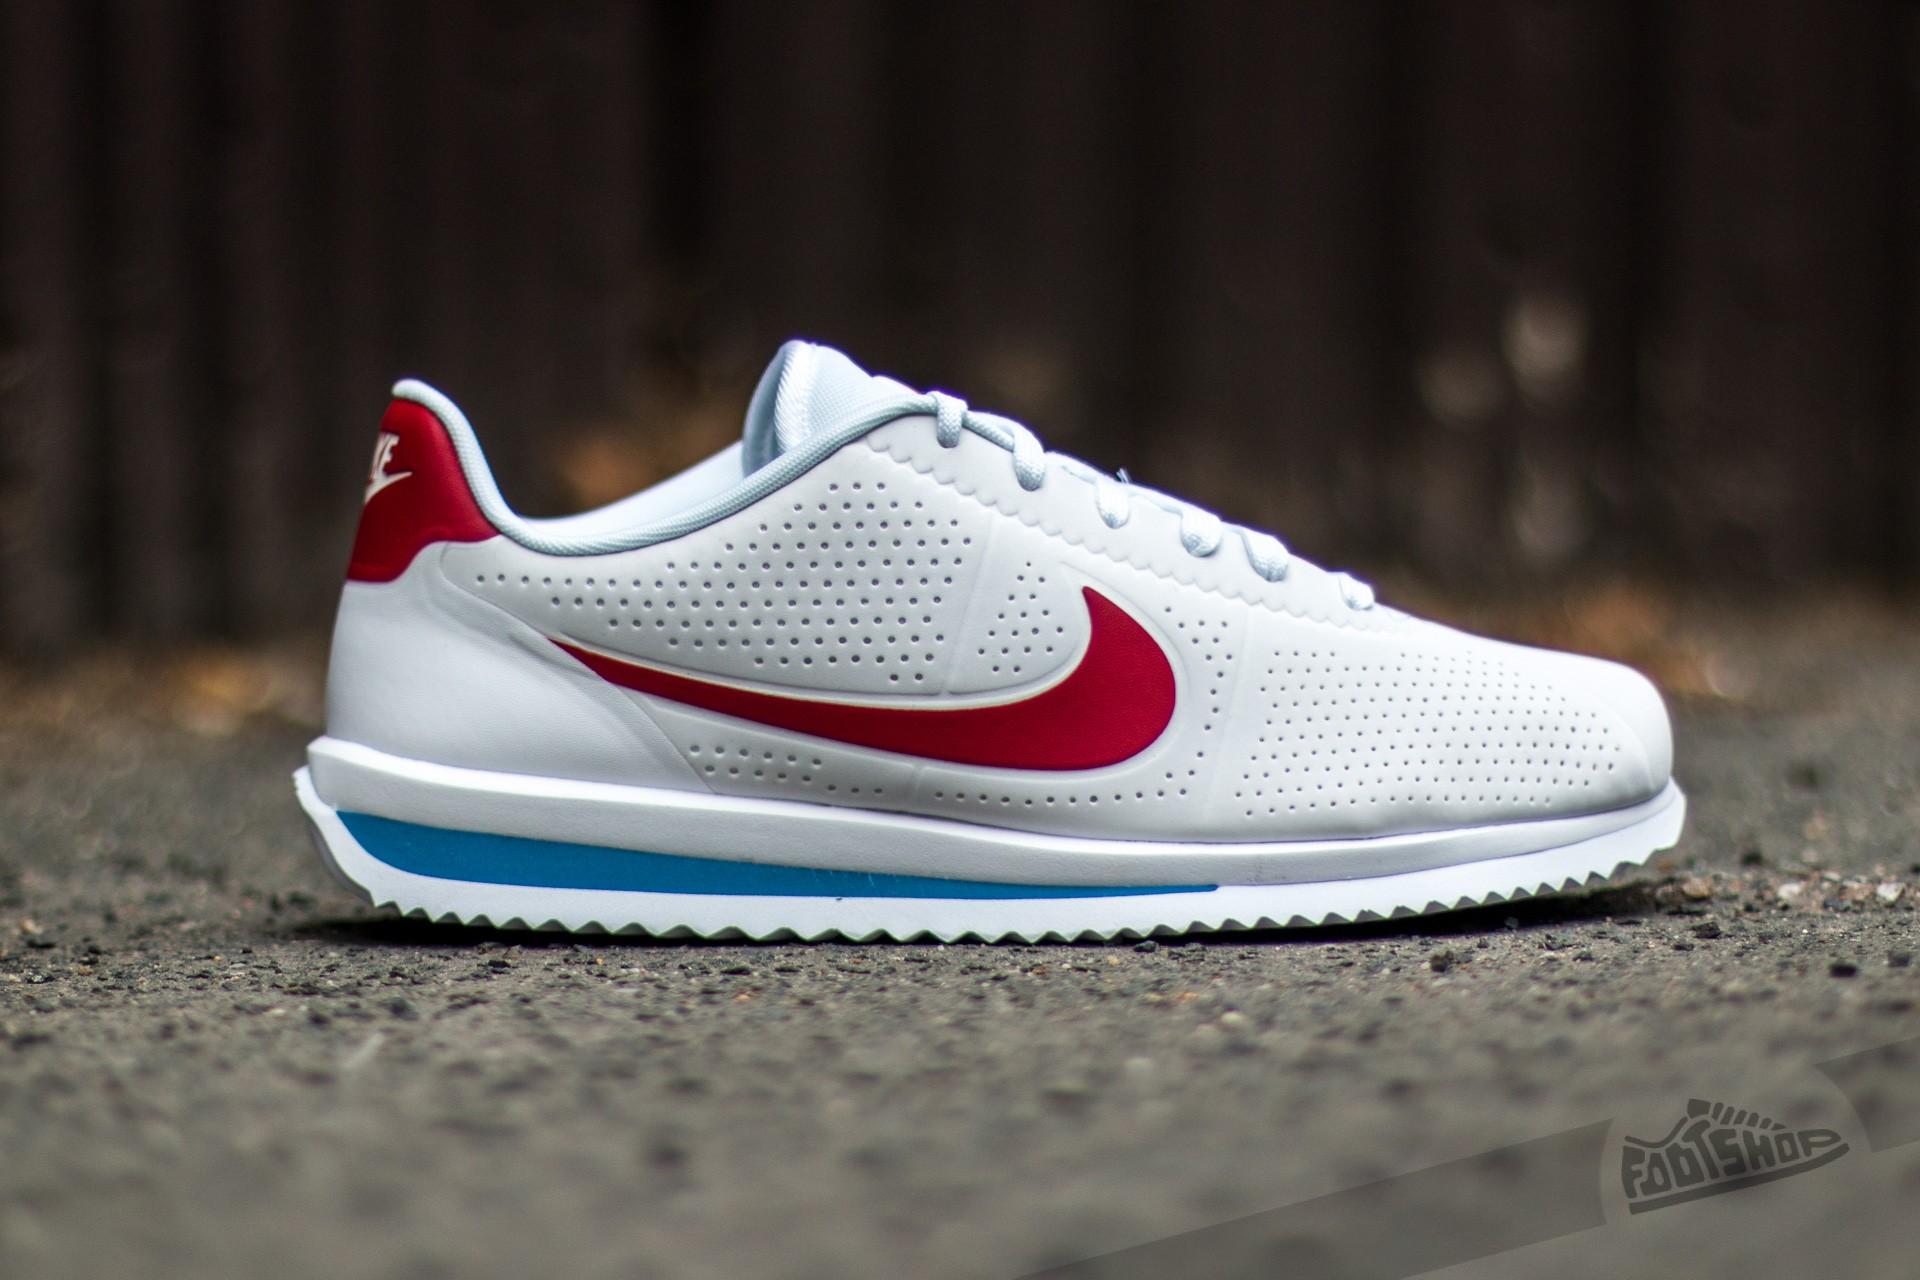 uk availability 7620f ec23b Nike Cortez Ultra Moire White/ Varsity Red-Varsity Blue ...